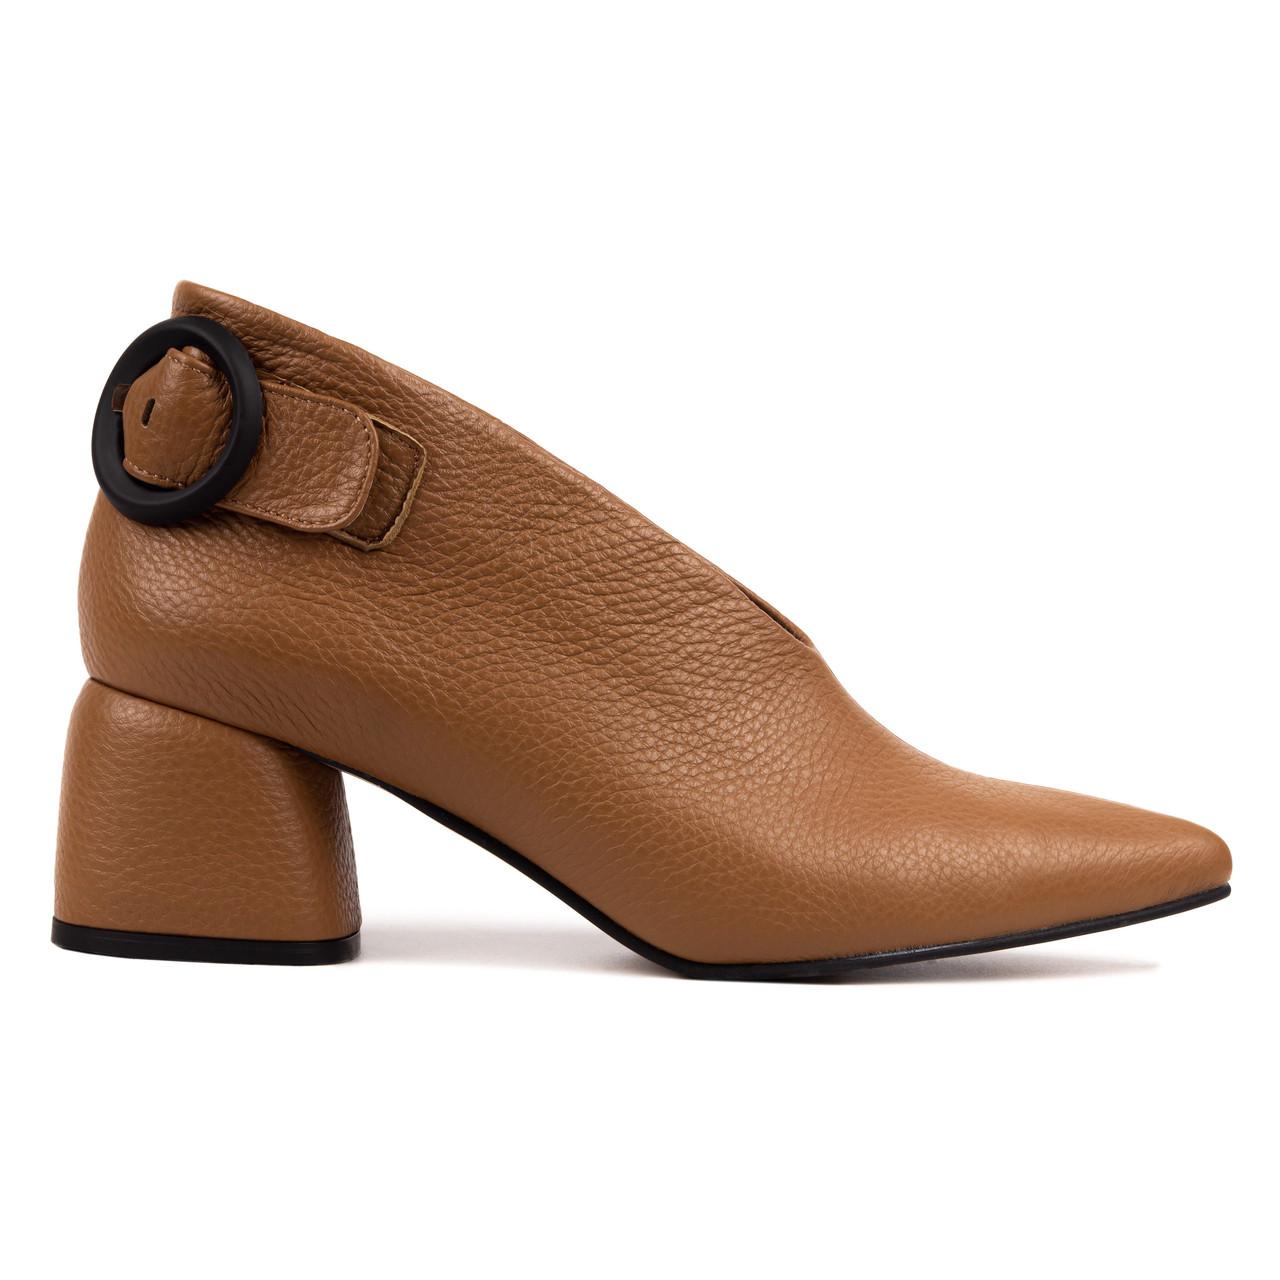 Туфли лодочки Woman's heel коричневые (О-881)